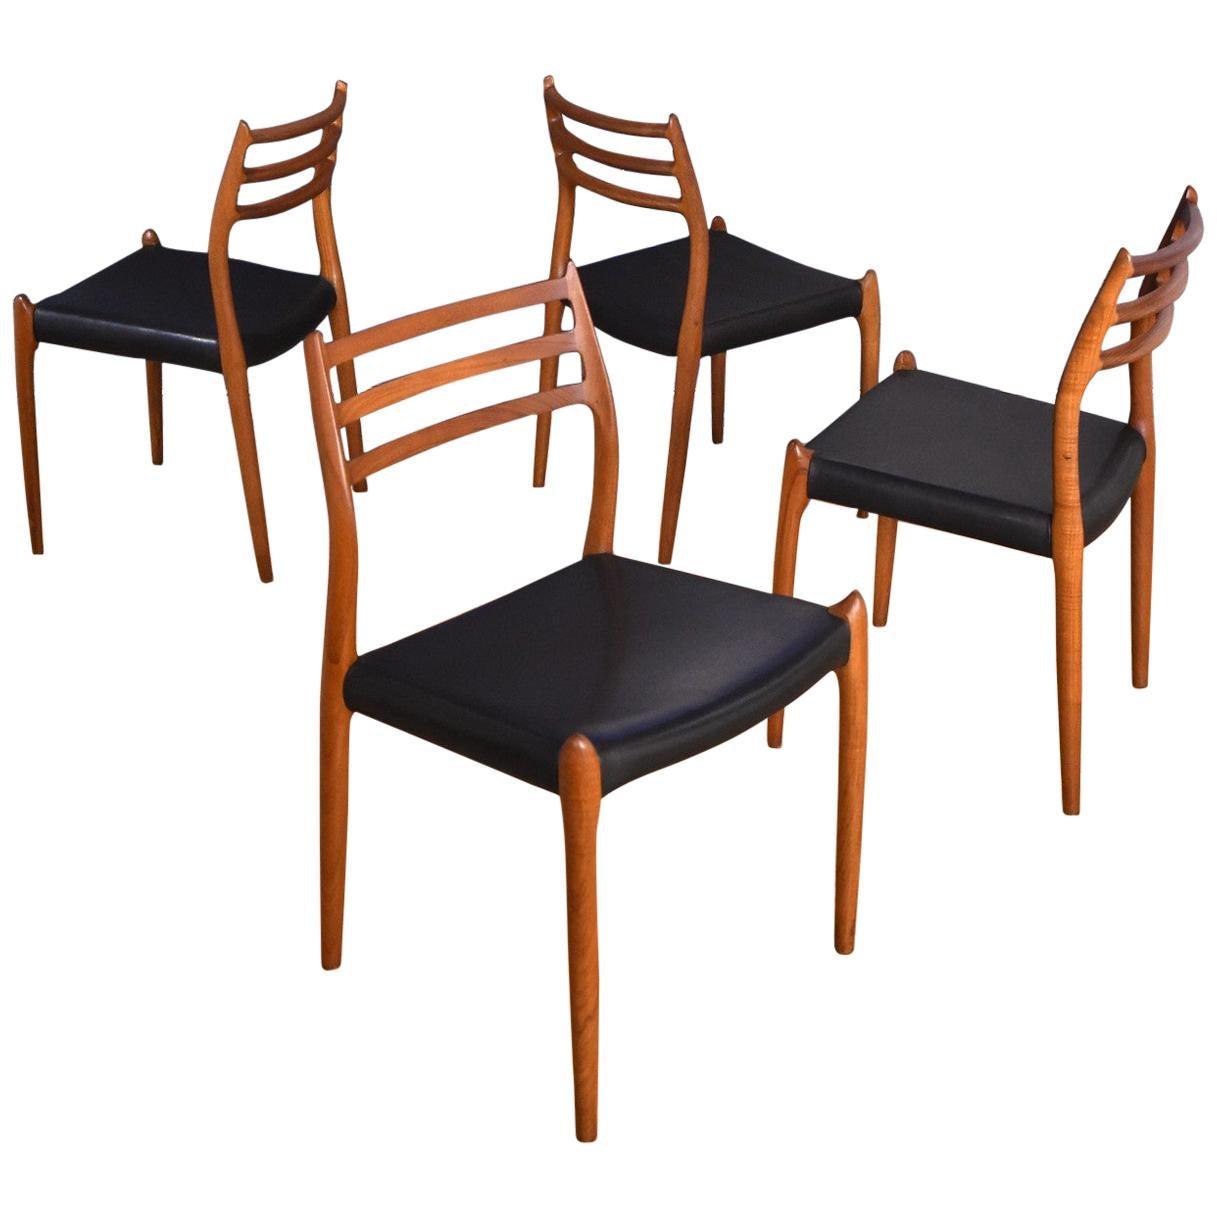 Niels Moller Model 78 Teak Dining Chairs for J L Mollers Mobelfabrik